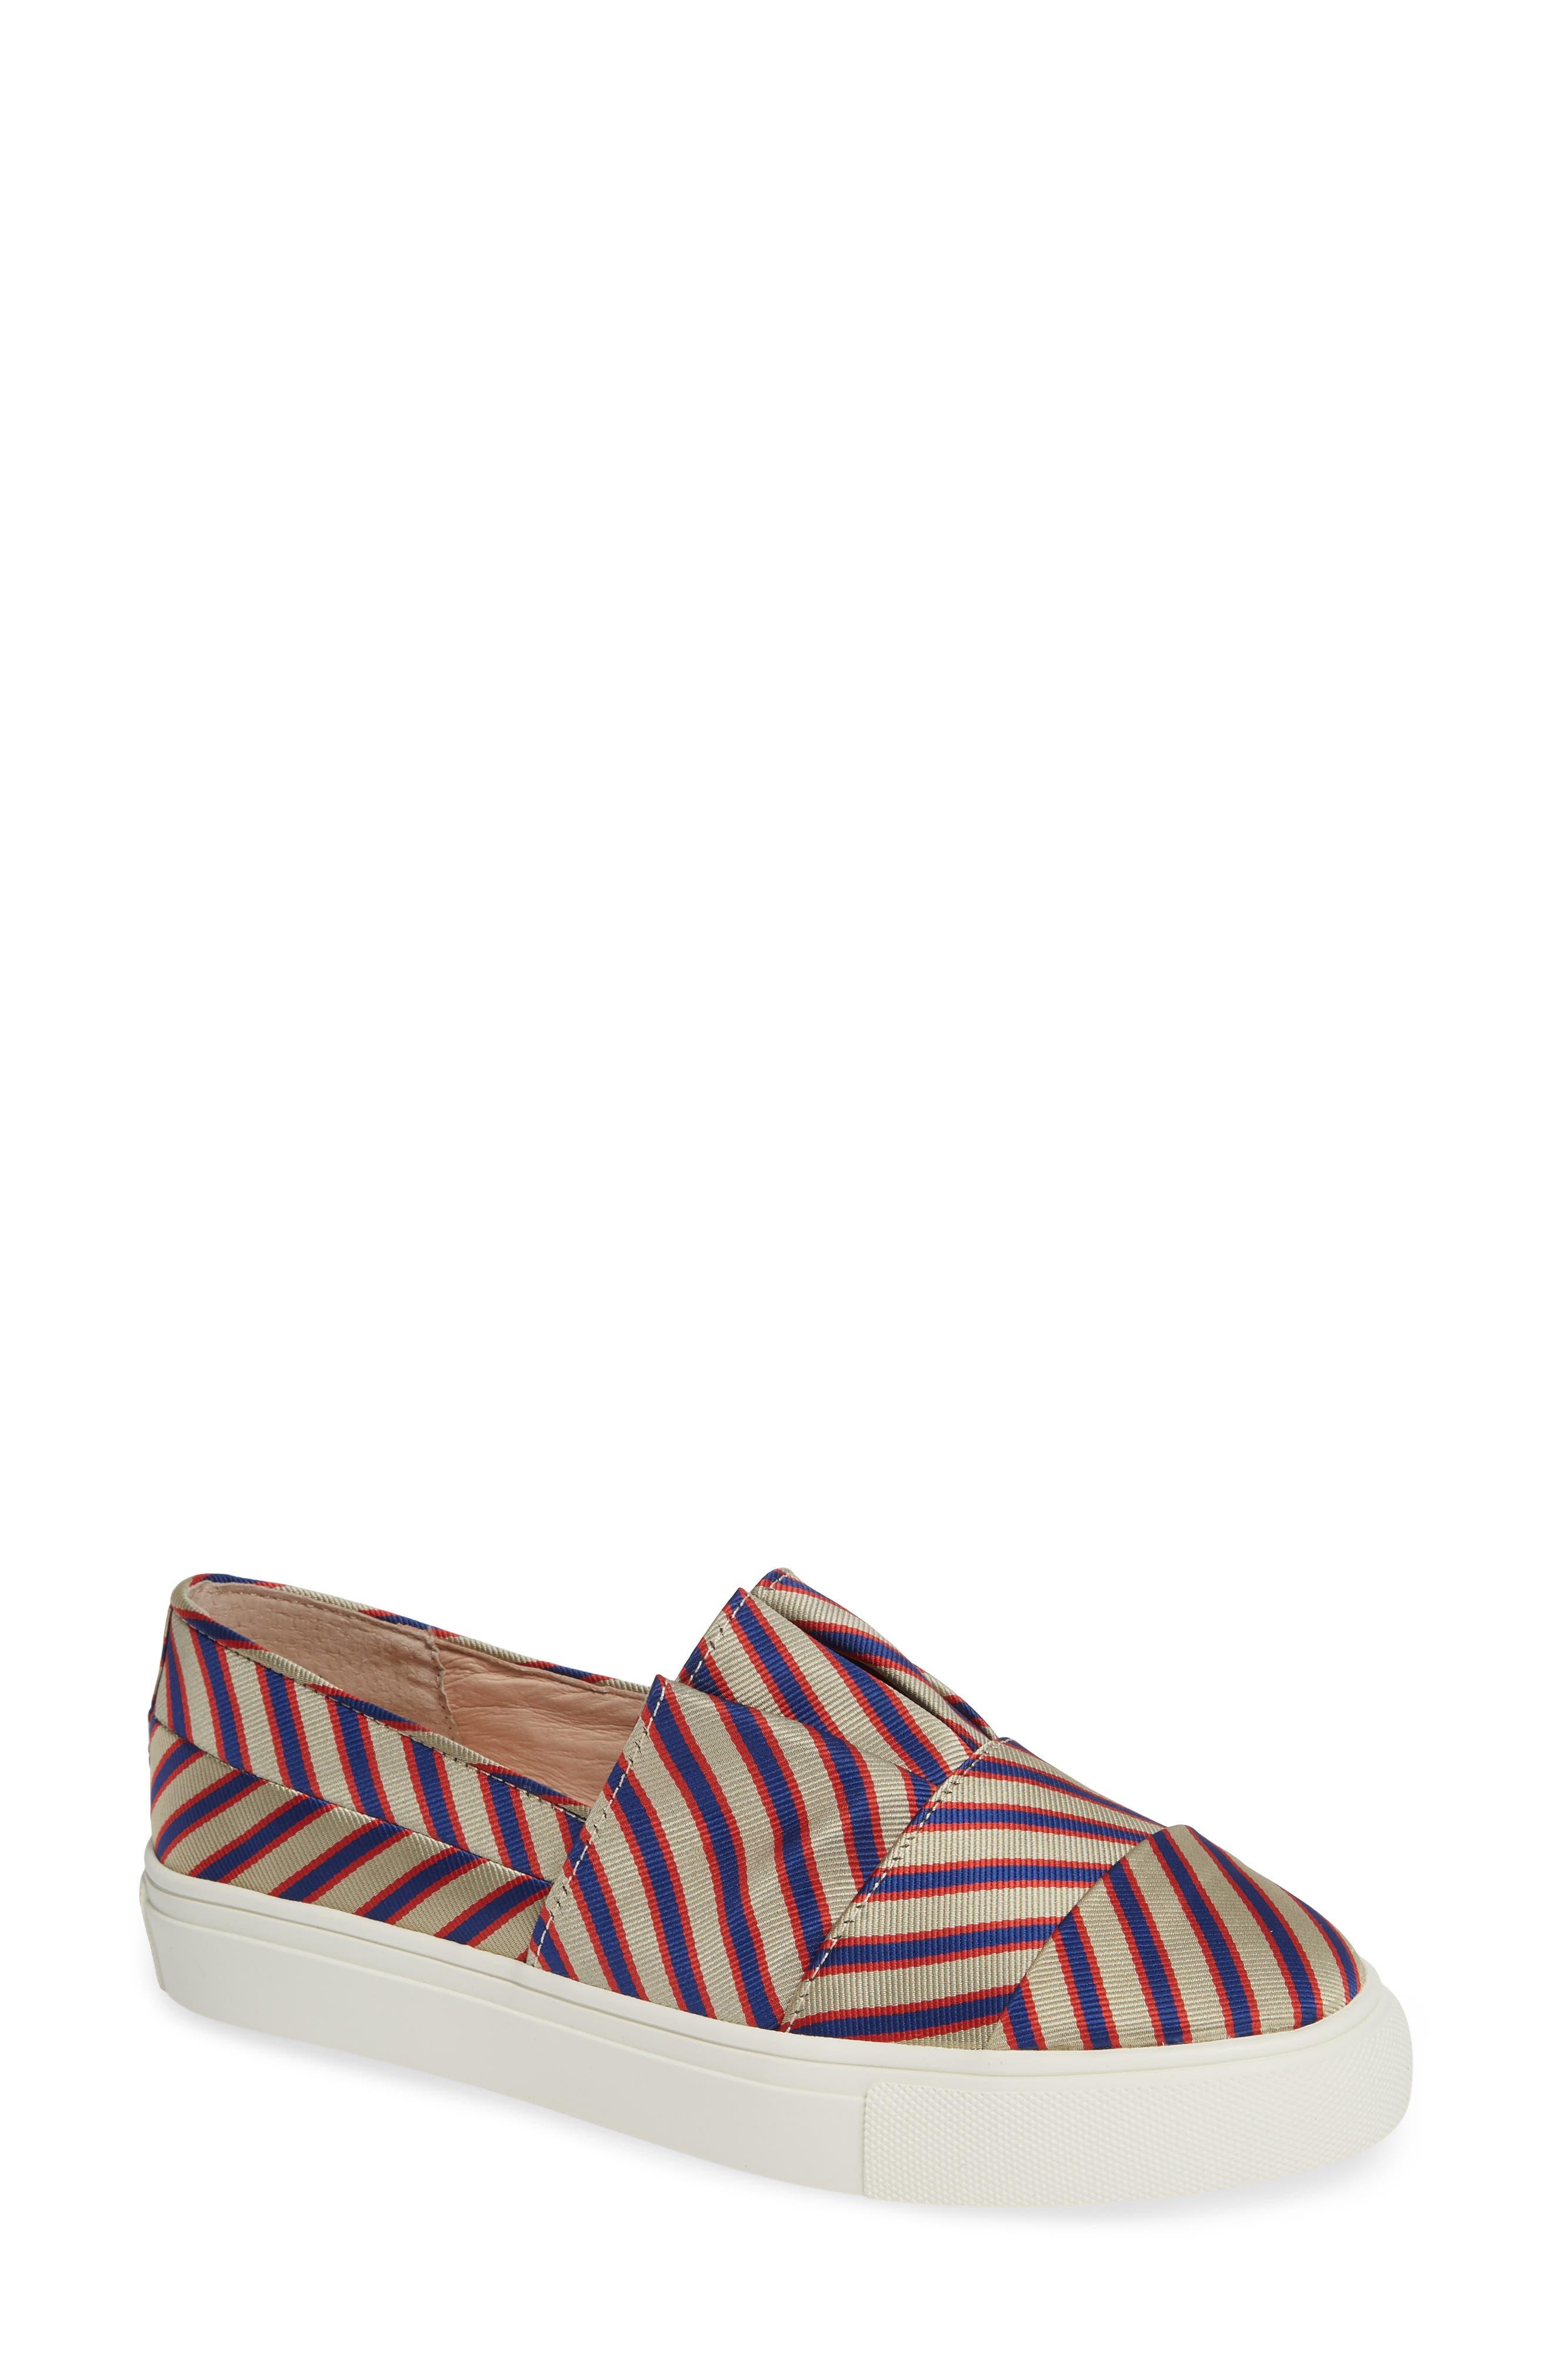 Rooney Slip-On Sneaker,                         Main,                         color, RED/ WHITE/ BLUE FABRIC